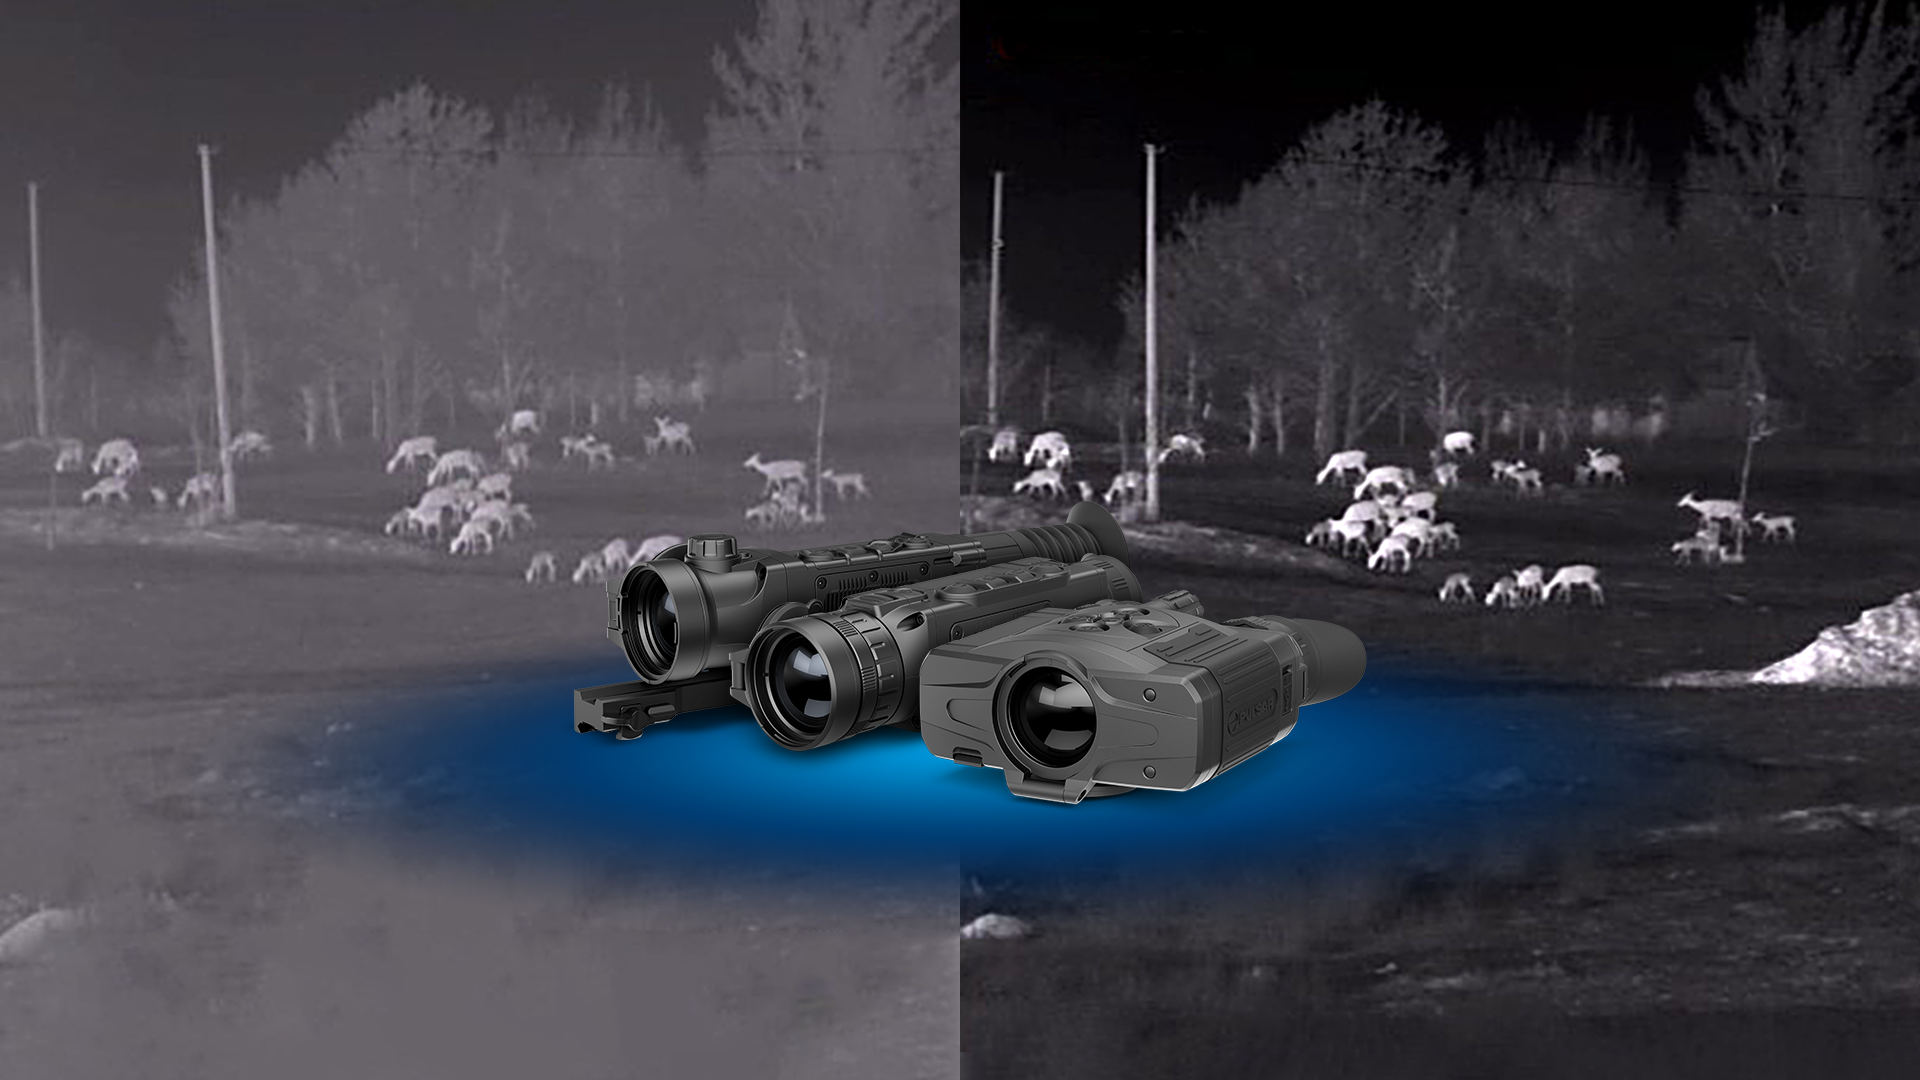 Professional Thermal and Night Vision Optics | Pulsar